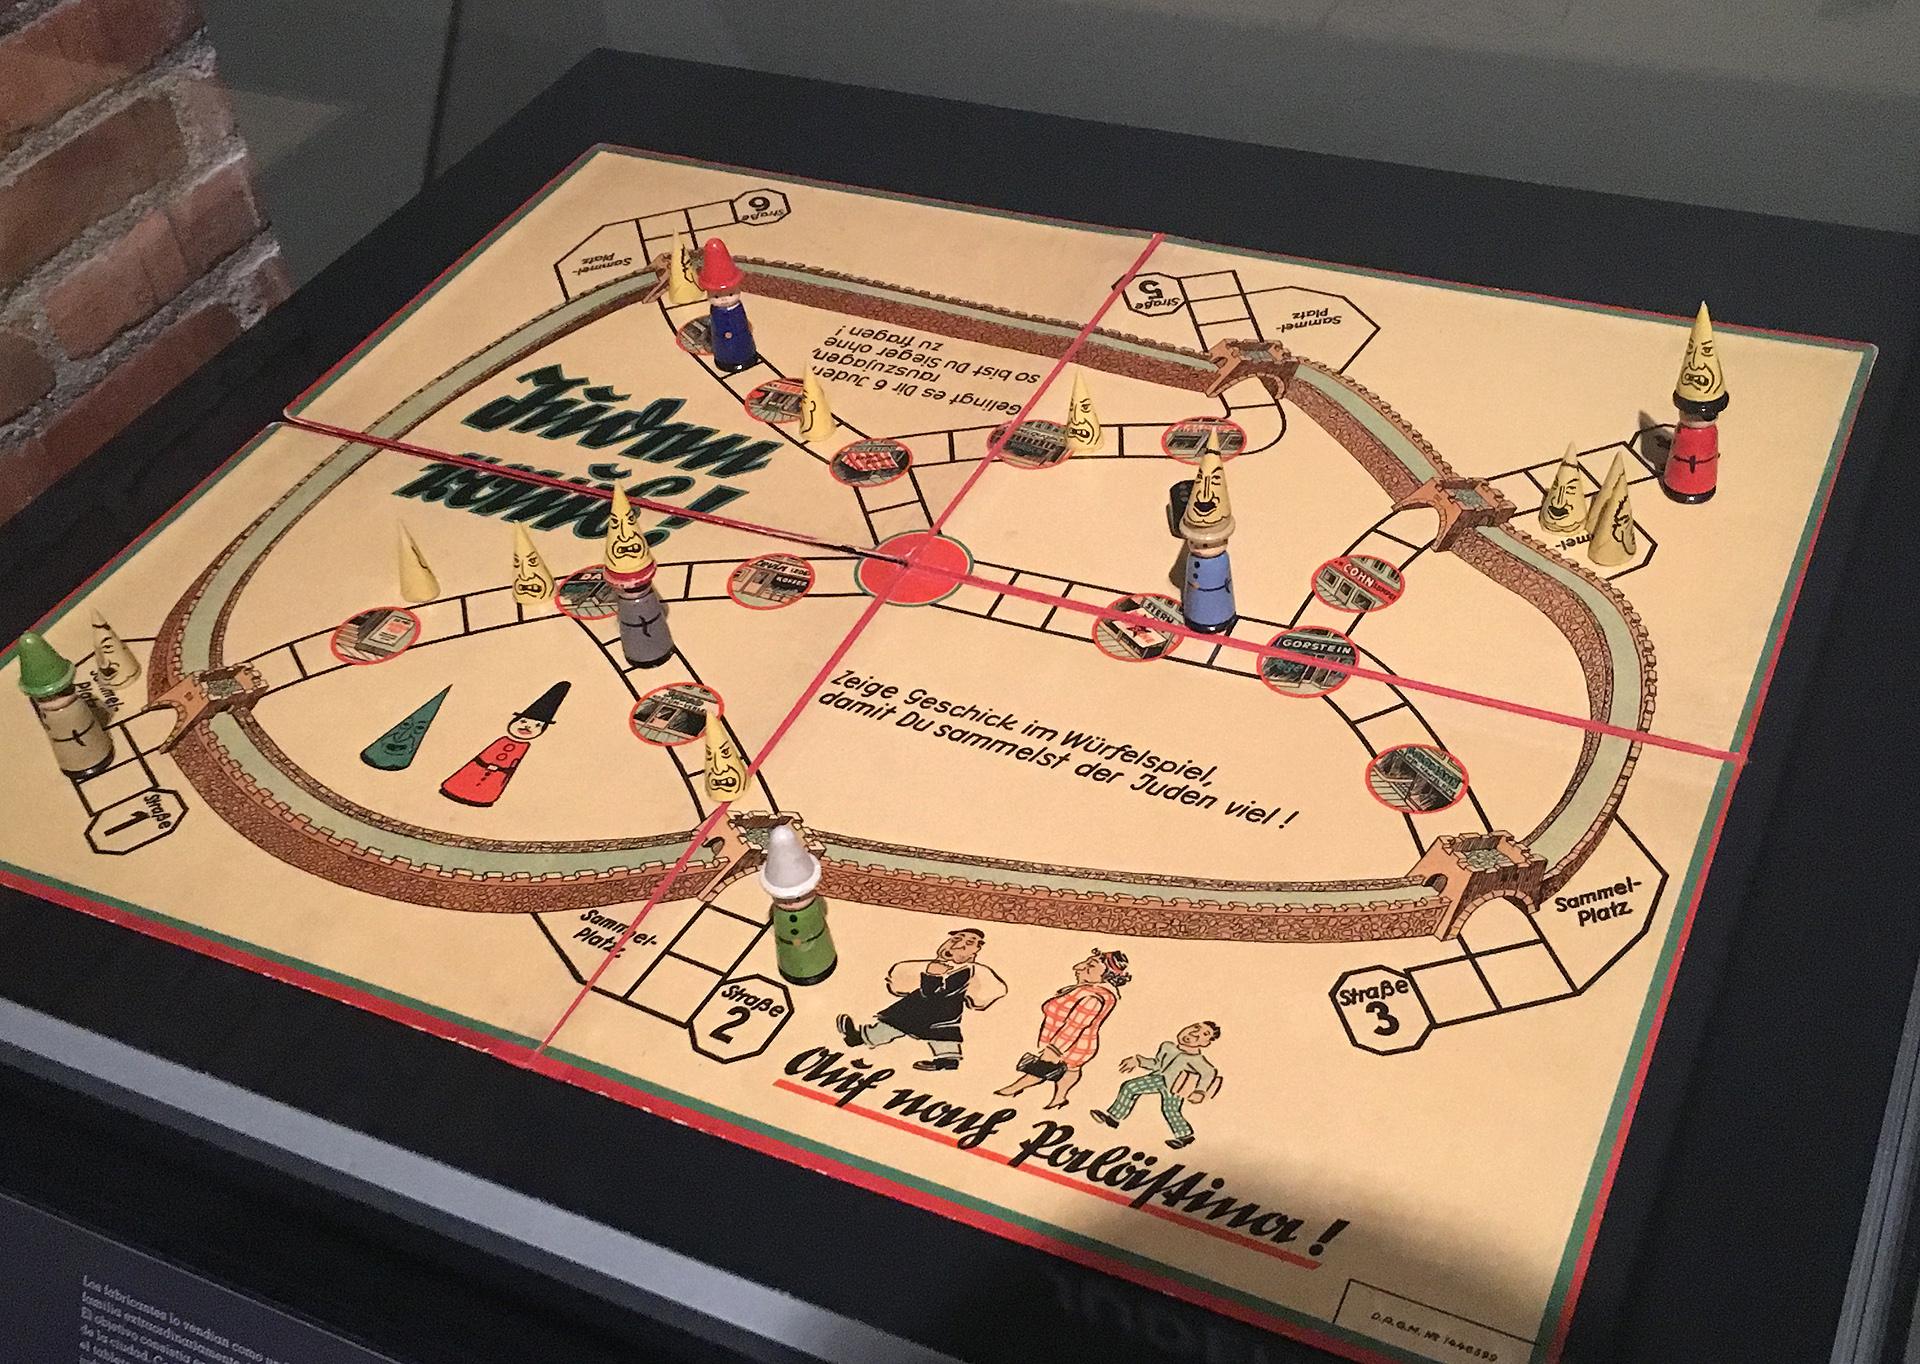 juego-de-mesa-nazi-expo-auschwitz-canal-